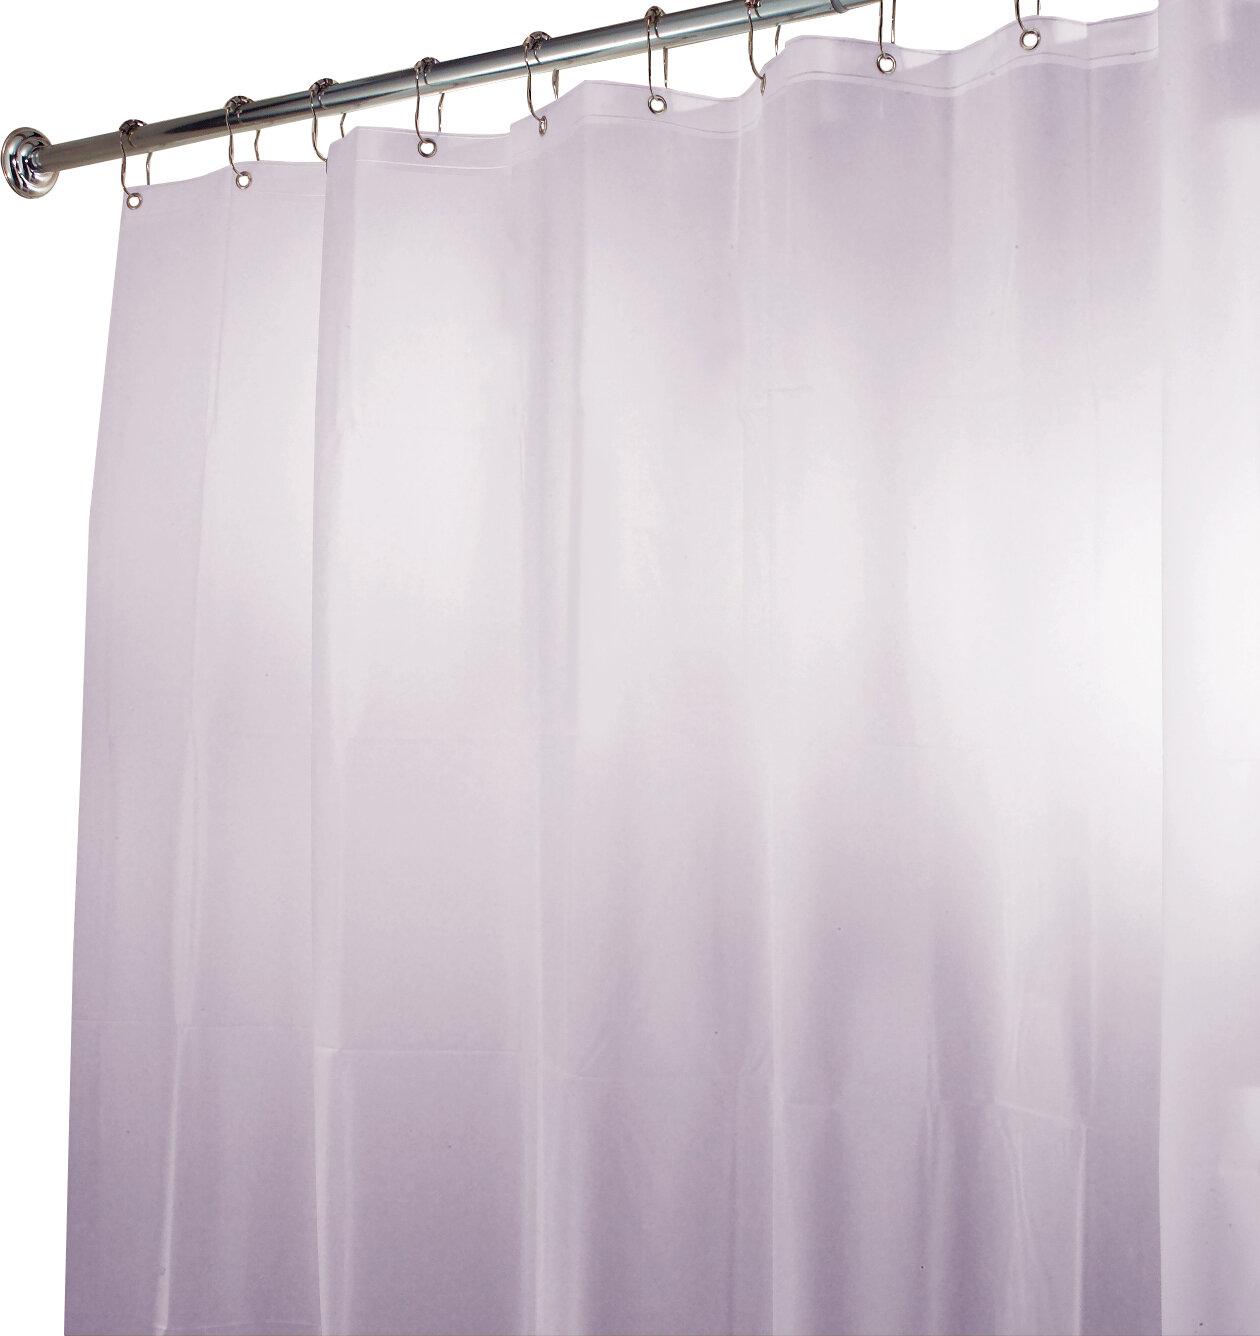 InterDesign EVA Waterproof Vinyl Shower Curtain Reviews